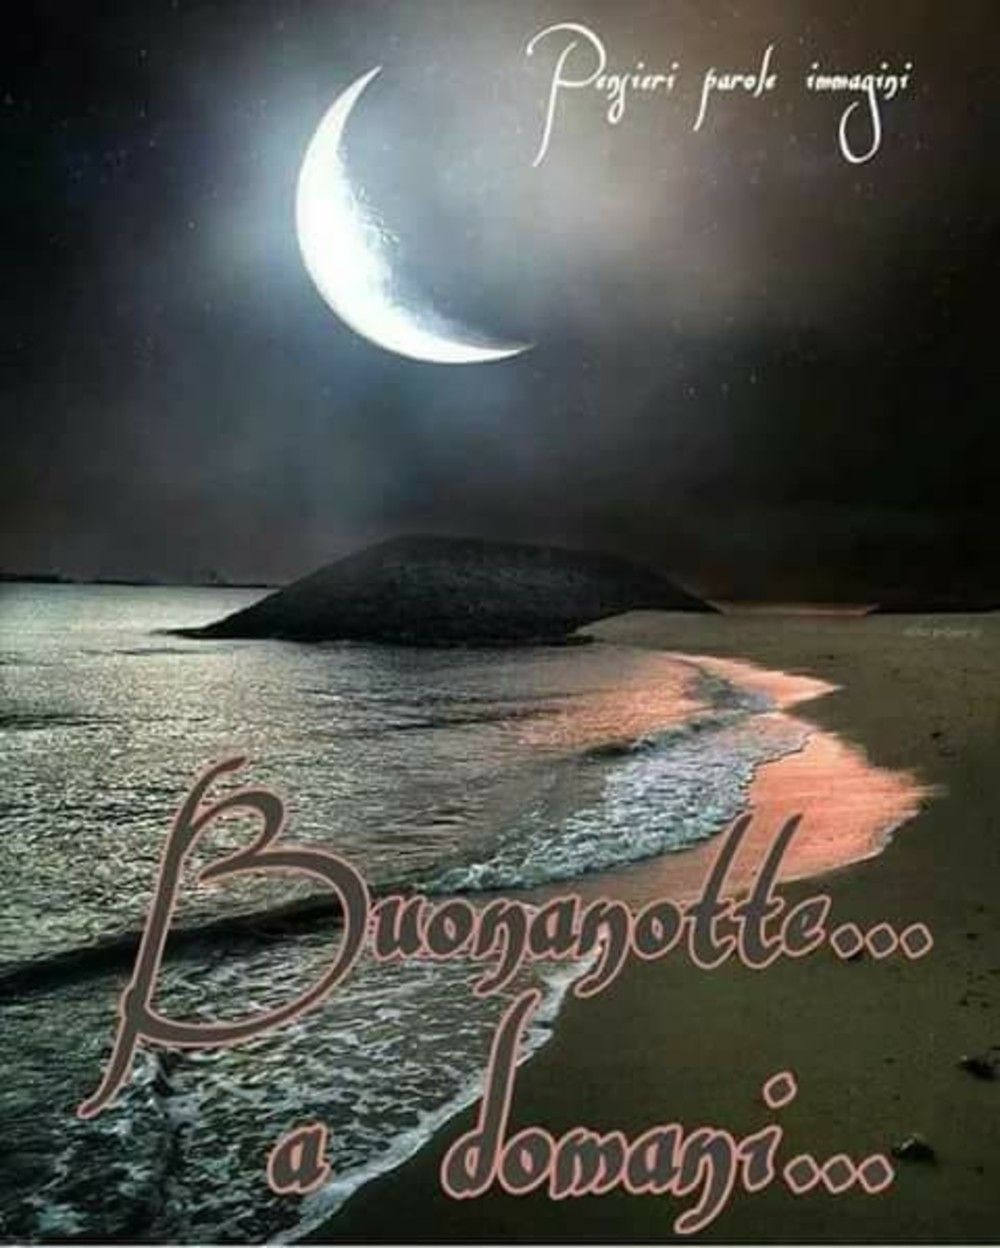 Belle Immagini Gratis Buonanotte Fotowhatsapp It